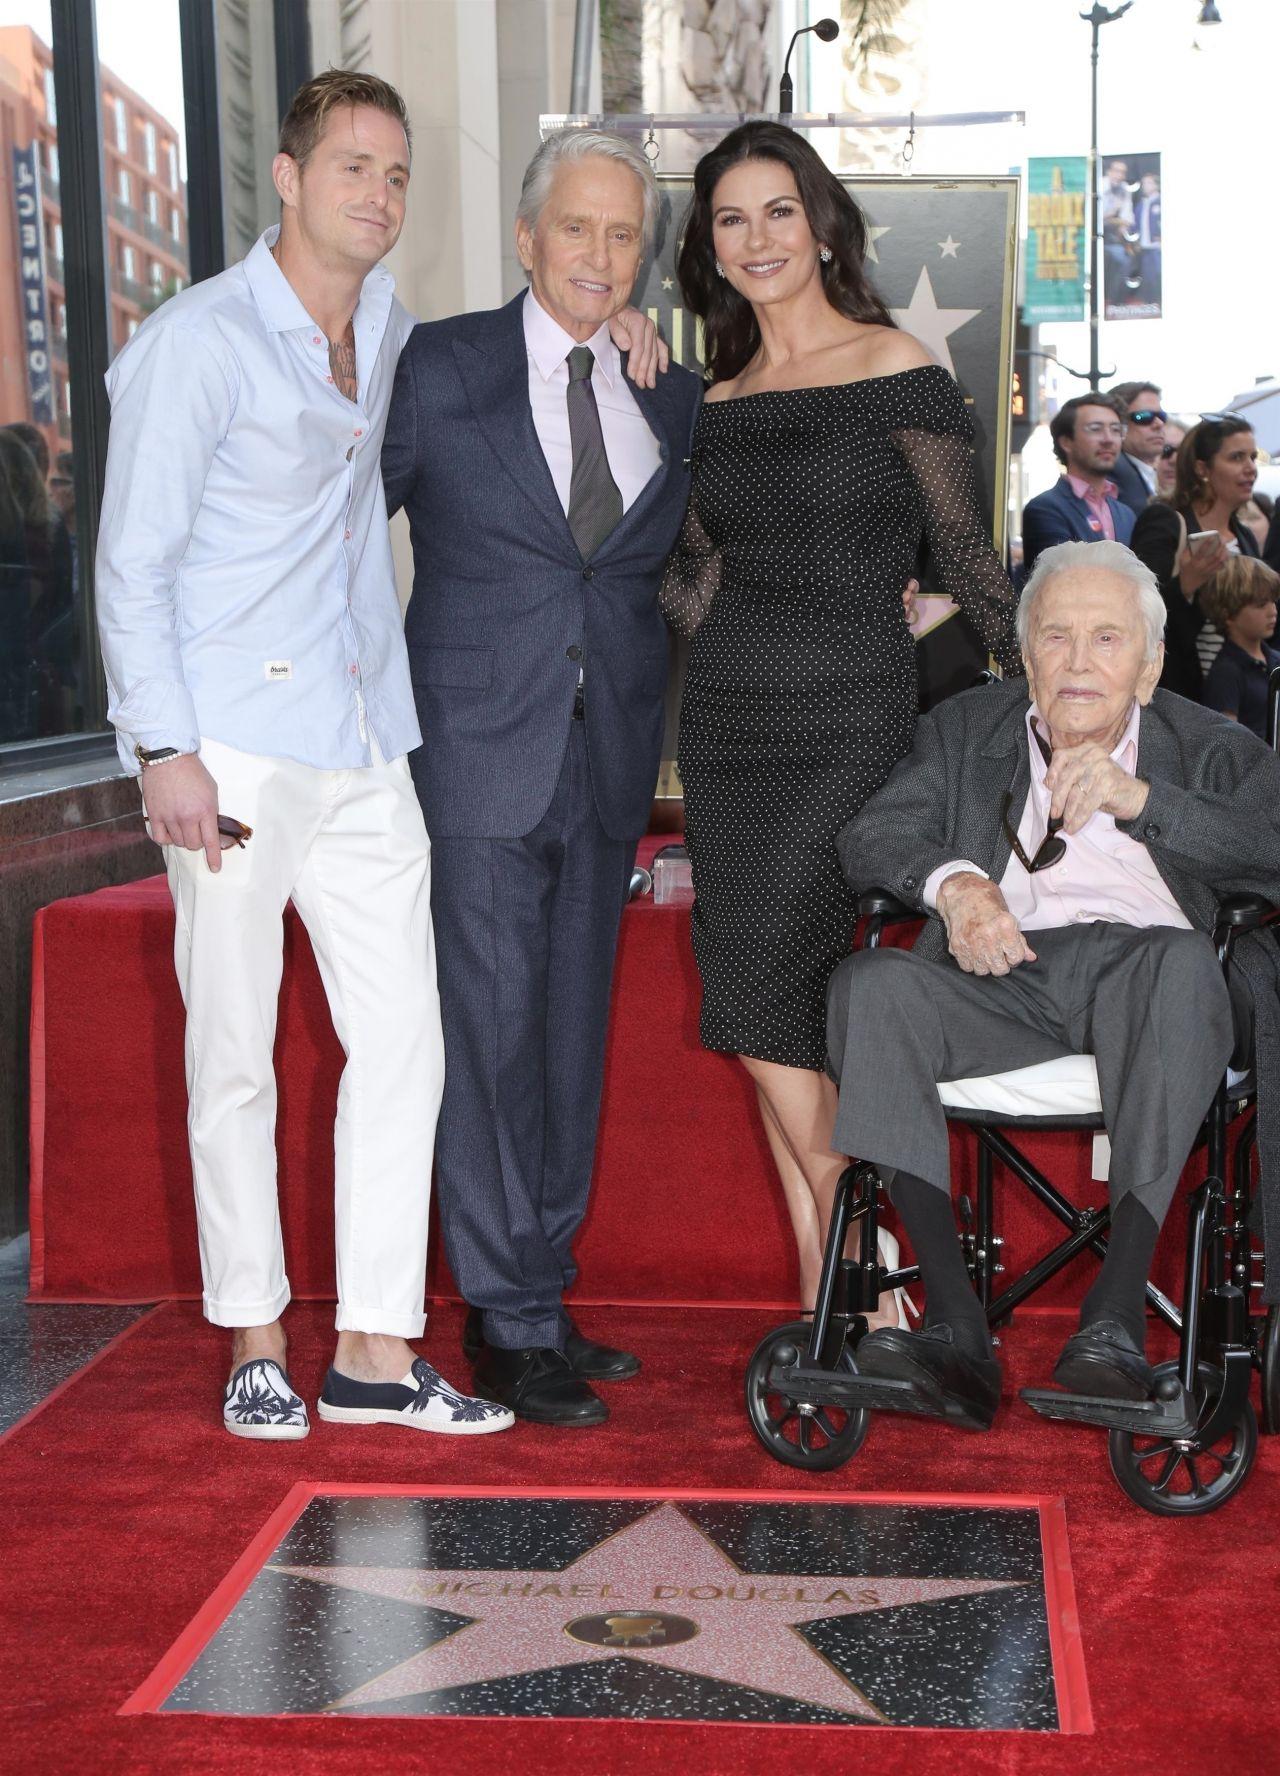 https://celebmafia.com/wp-content/uploads/2018/11/catherine-zeta-jones-michael-douglas-honored-with-a-star-on-the-hollywood-walk-of-fame-11-06-2018-10.jpg